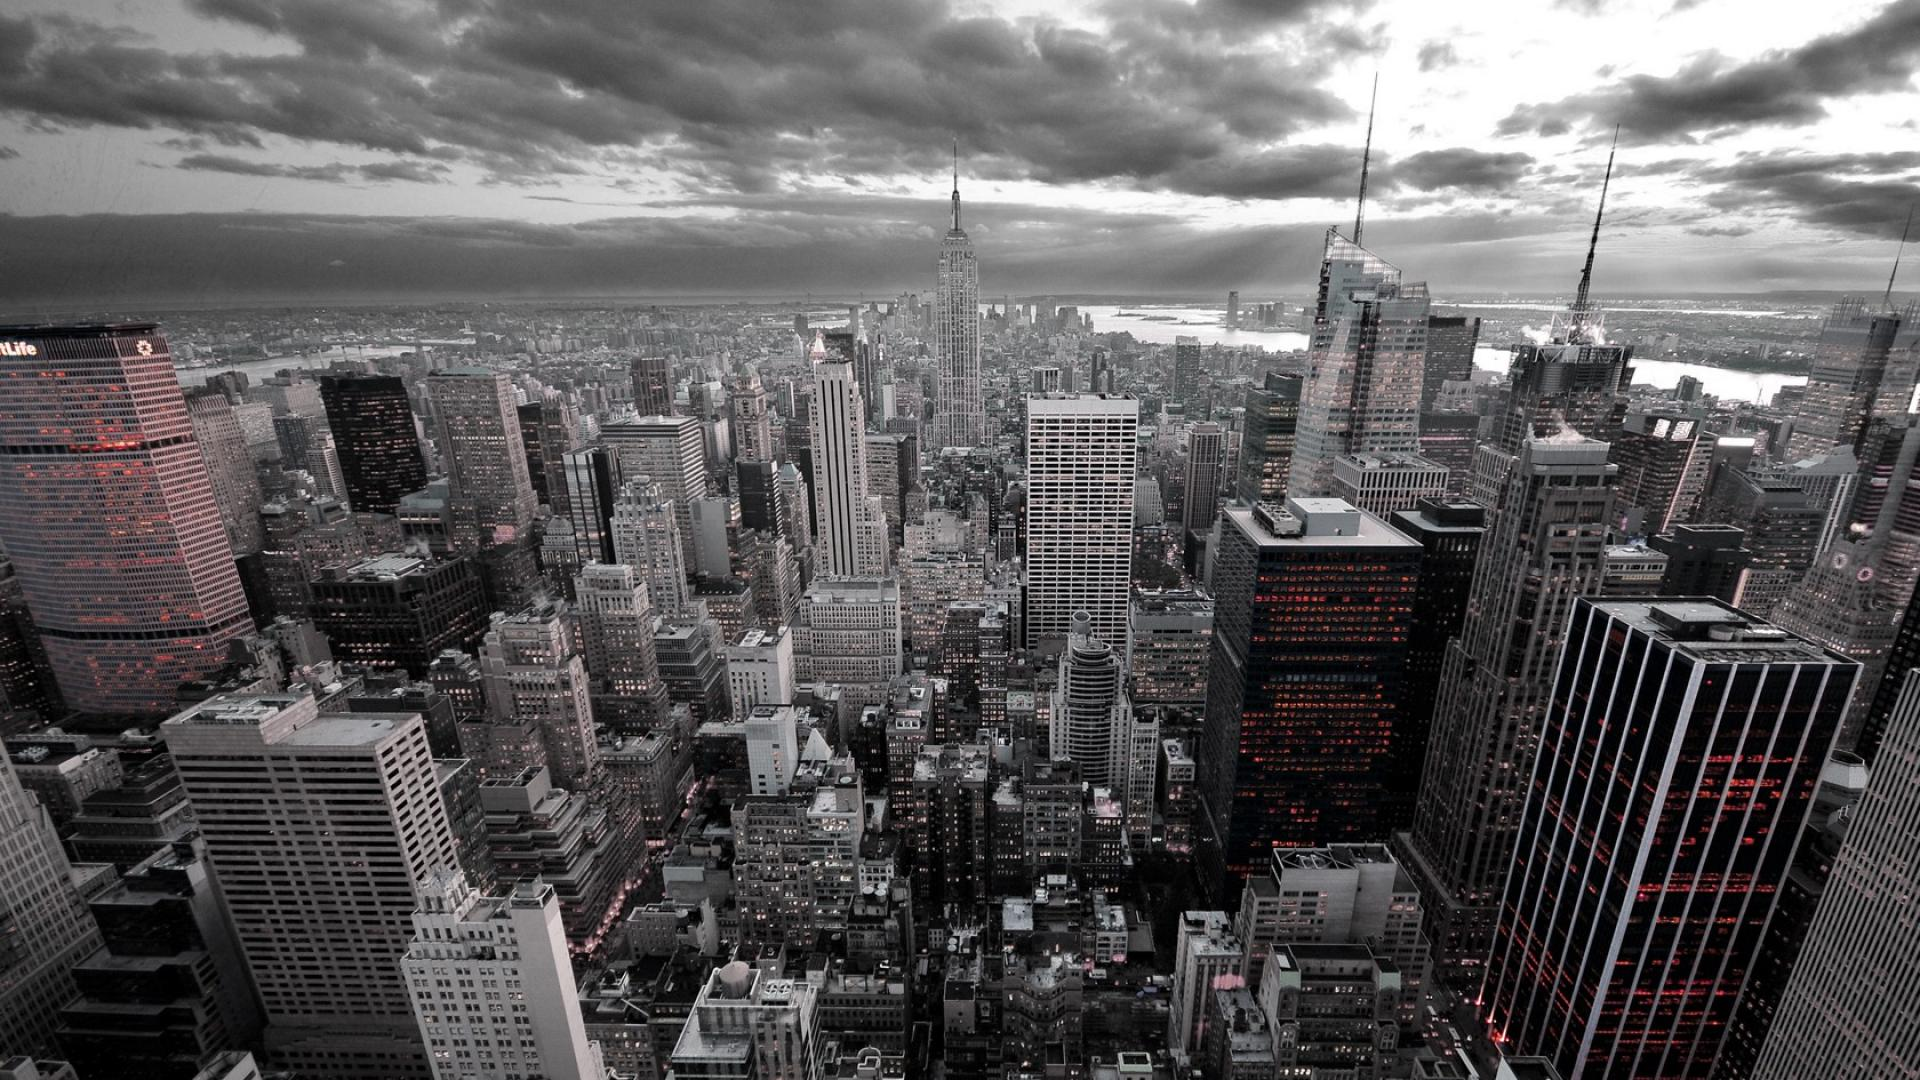 New York City Black and White HD Wallpaper of City   hdwallpaper2013 1920x1080